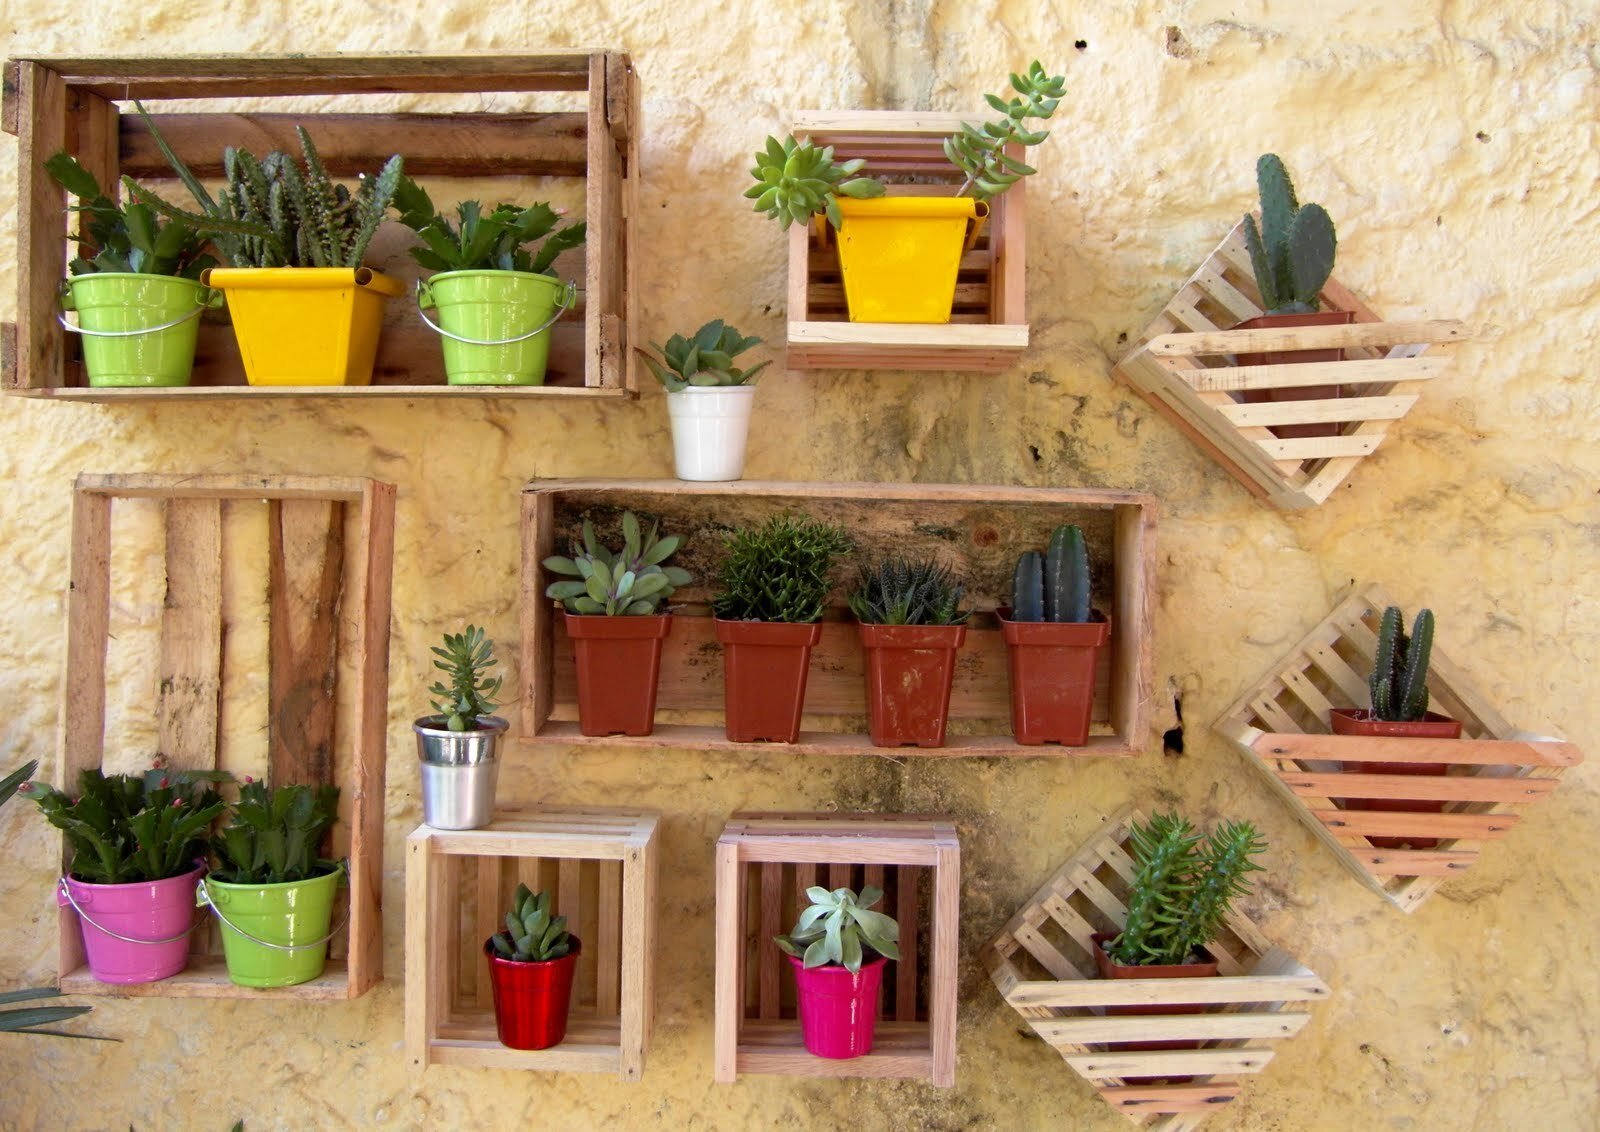 jardins quintal pequeno:Ideas Creativas De Jardin